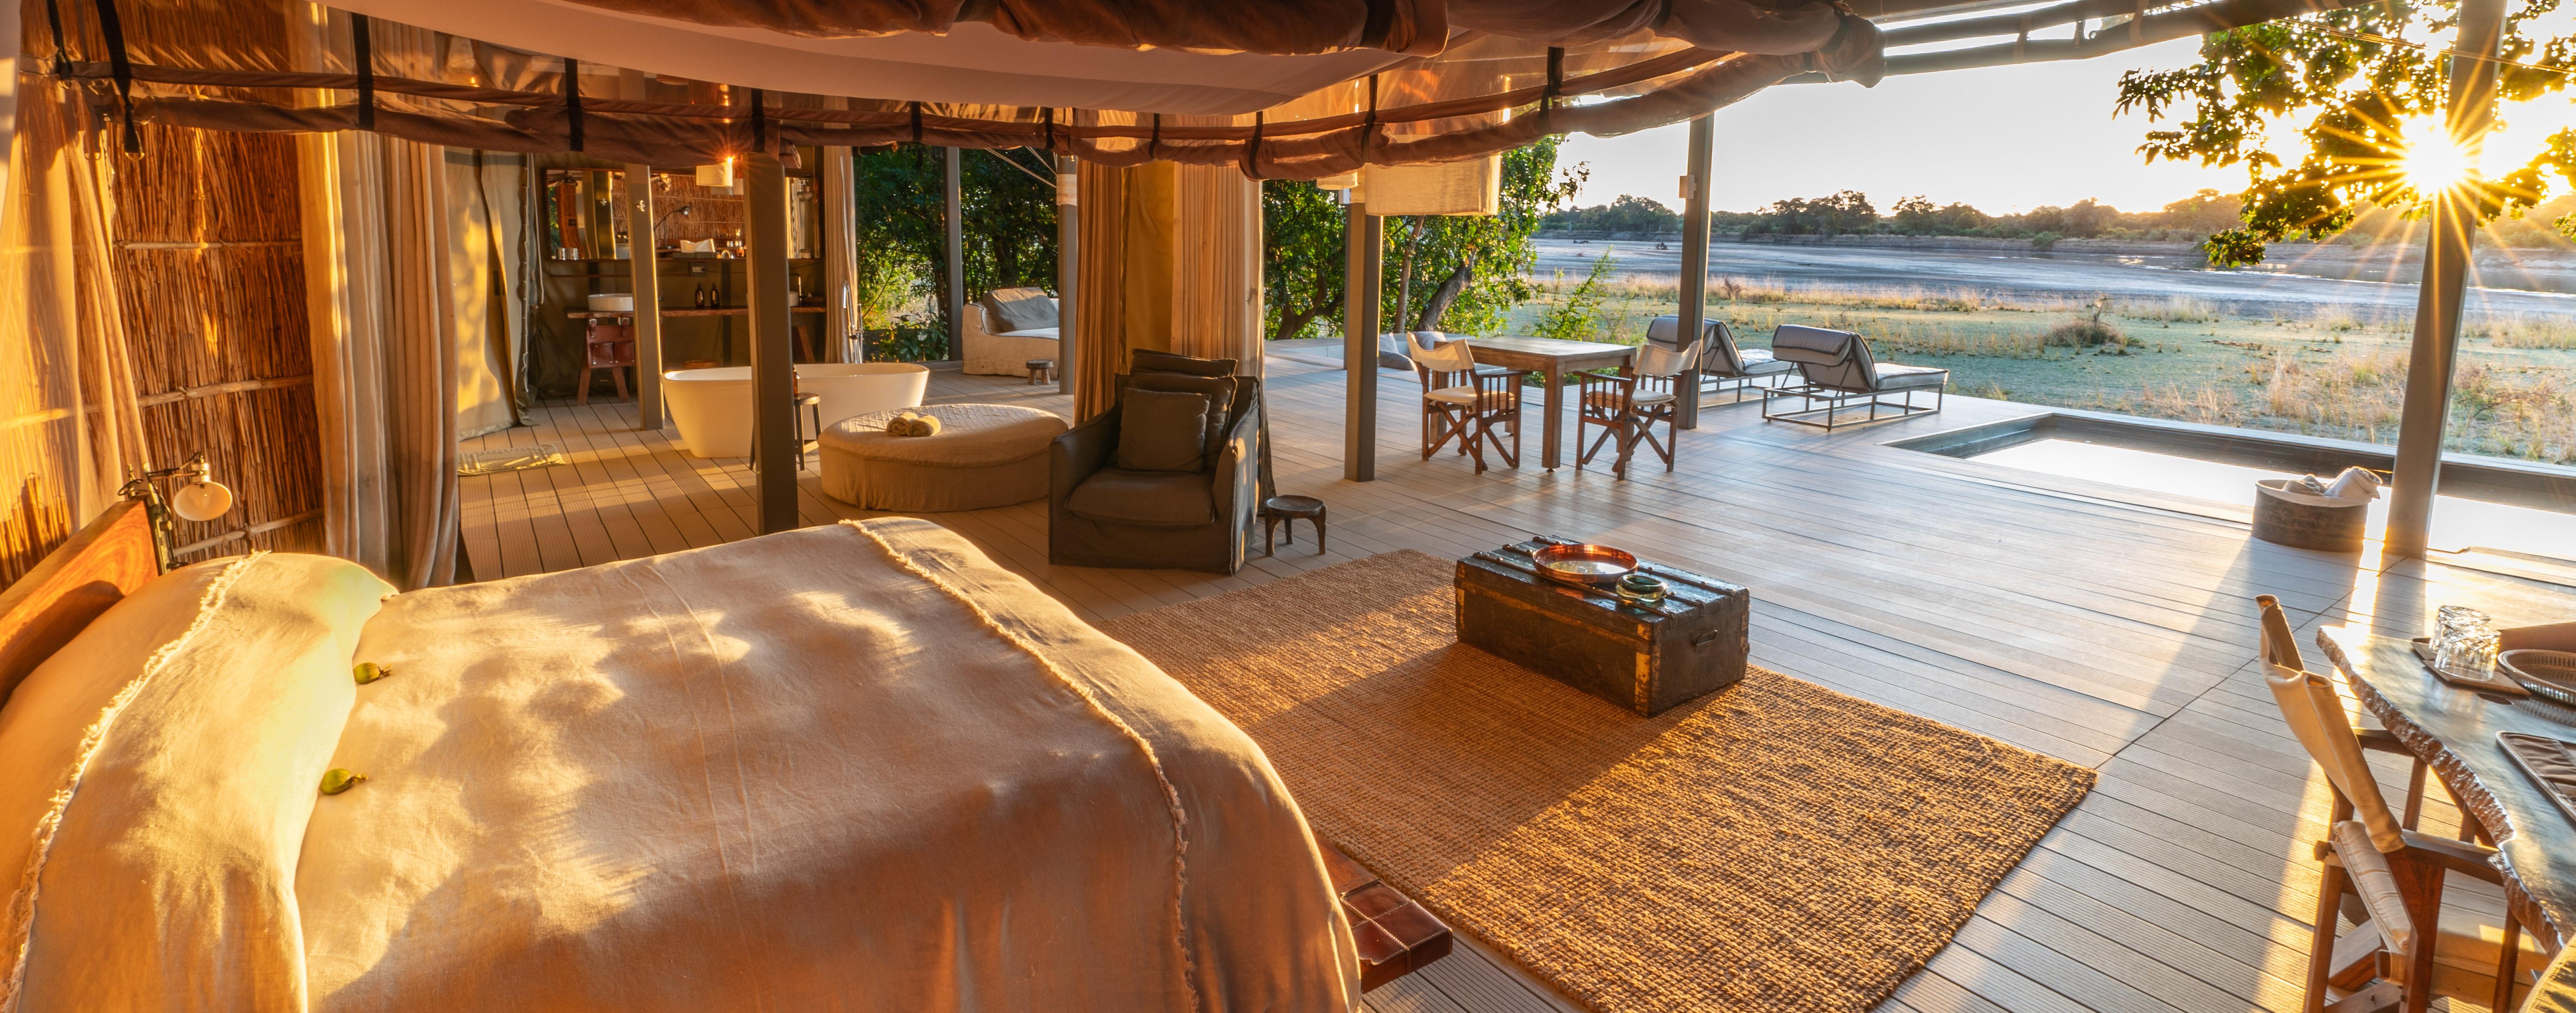 chinzombo-luxury-suite-interior